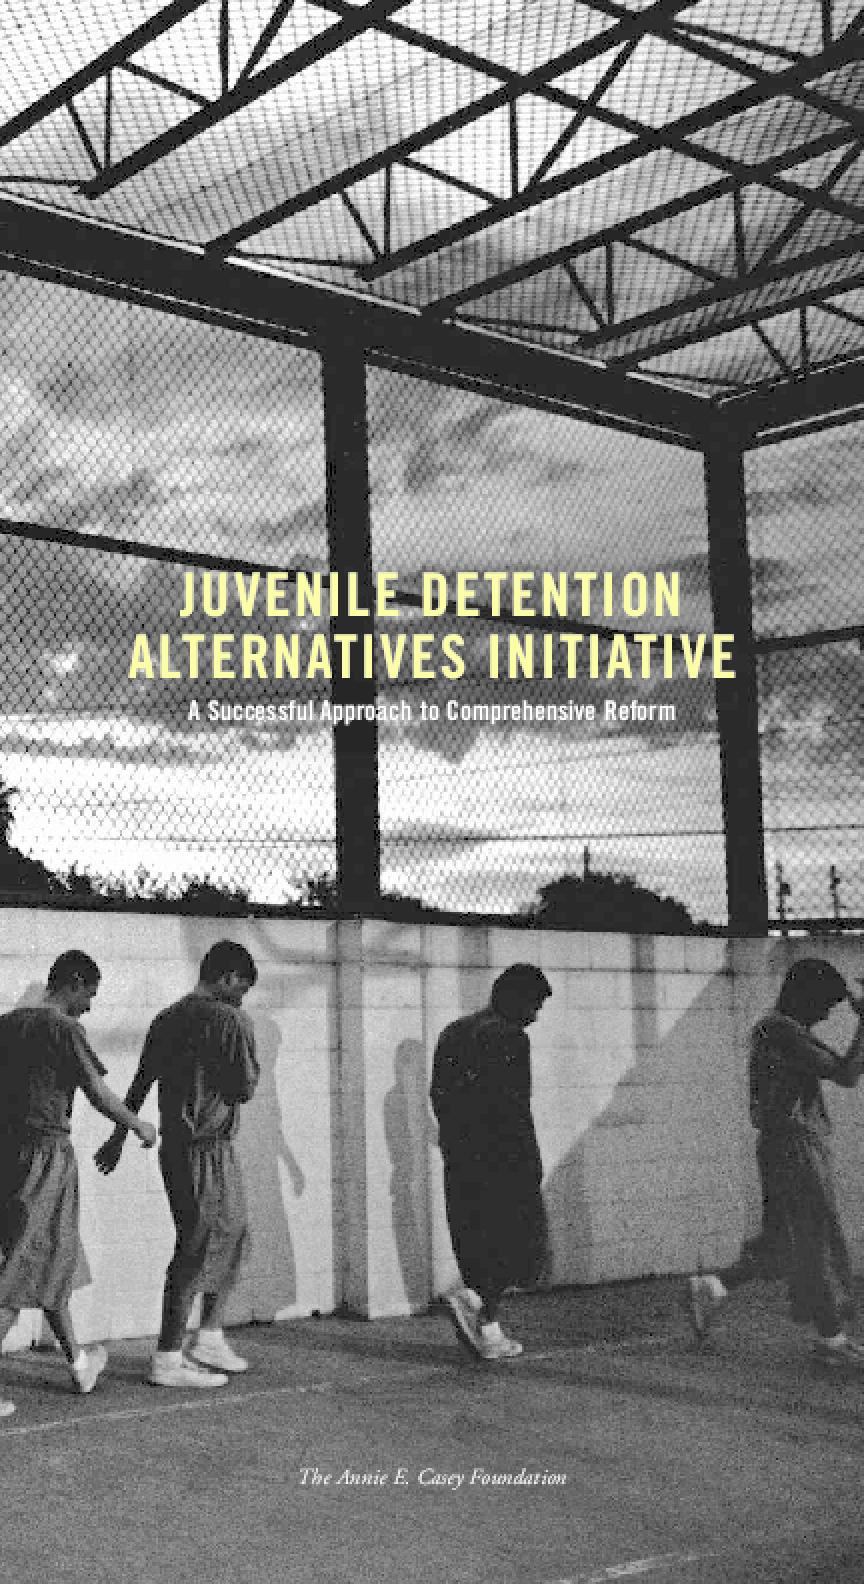 Juvenile Detention Alternatives Initiative: A Successful Approach to Comprehensive Reform